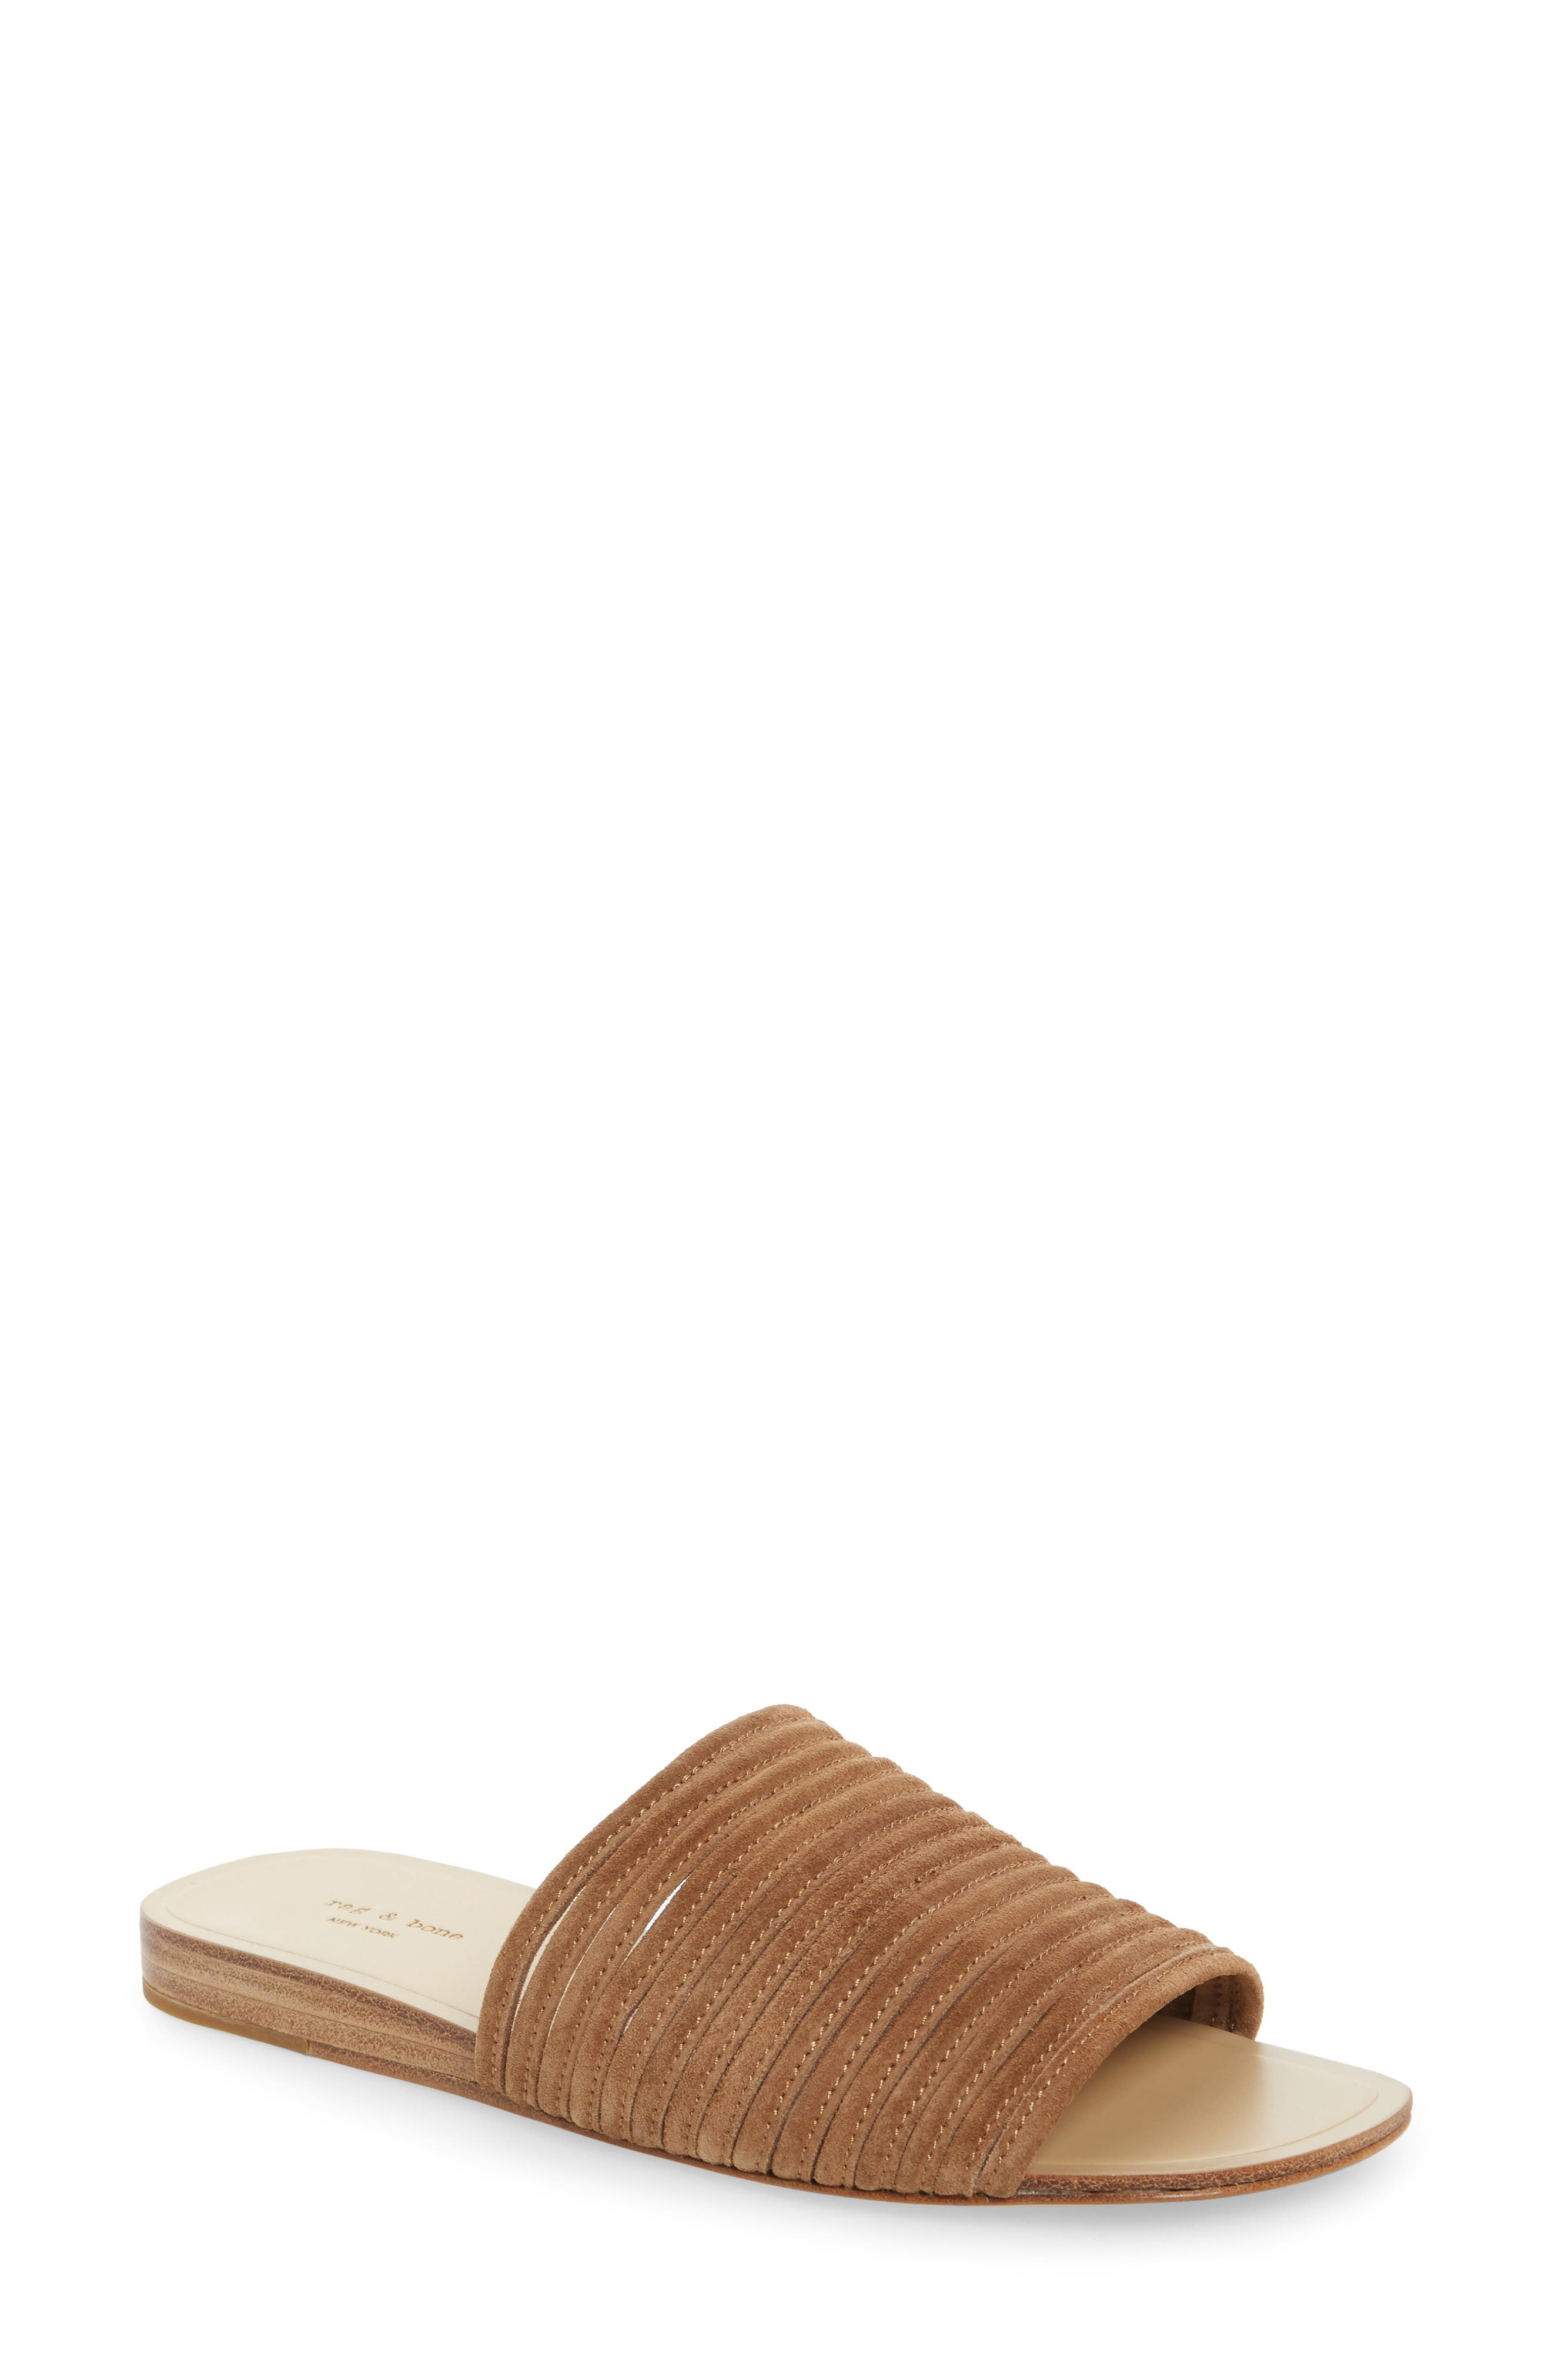 Main Image - rag & bone Cameron Slide Sandal (Women)